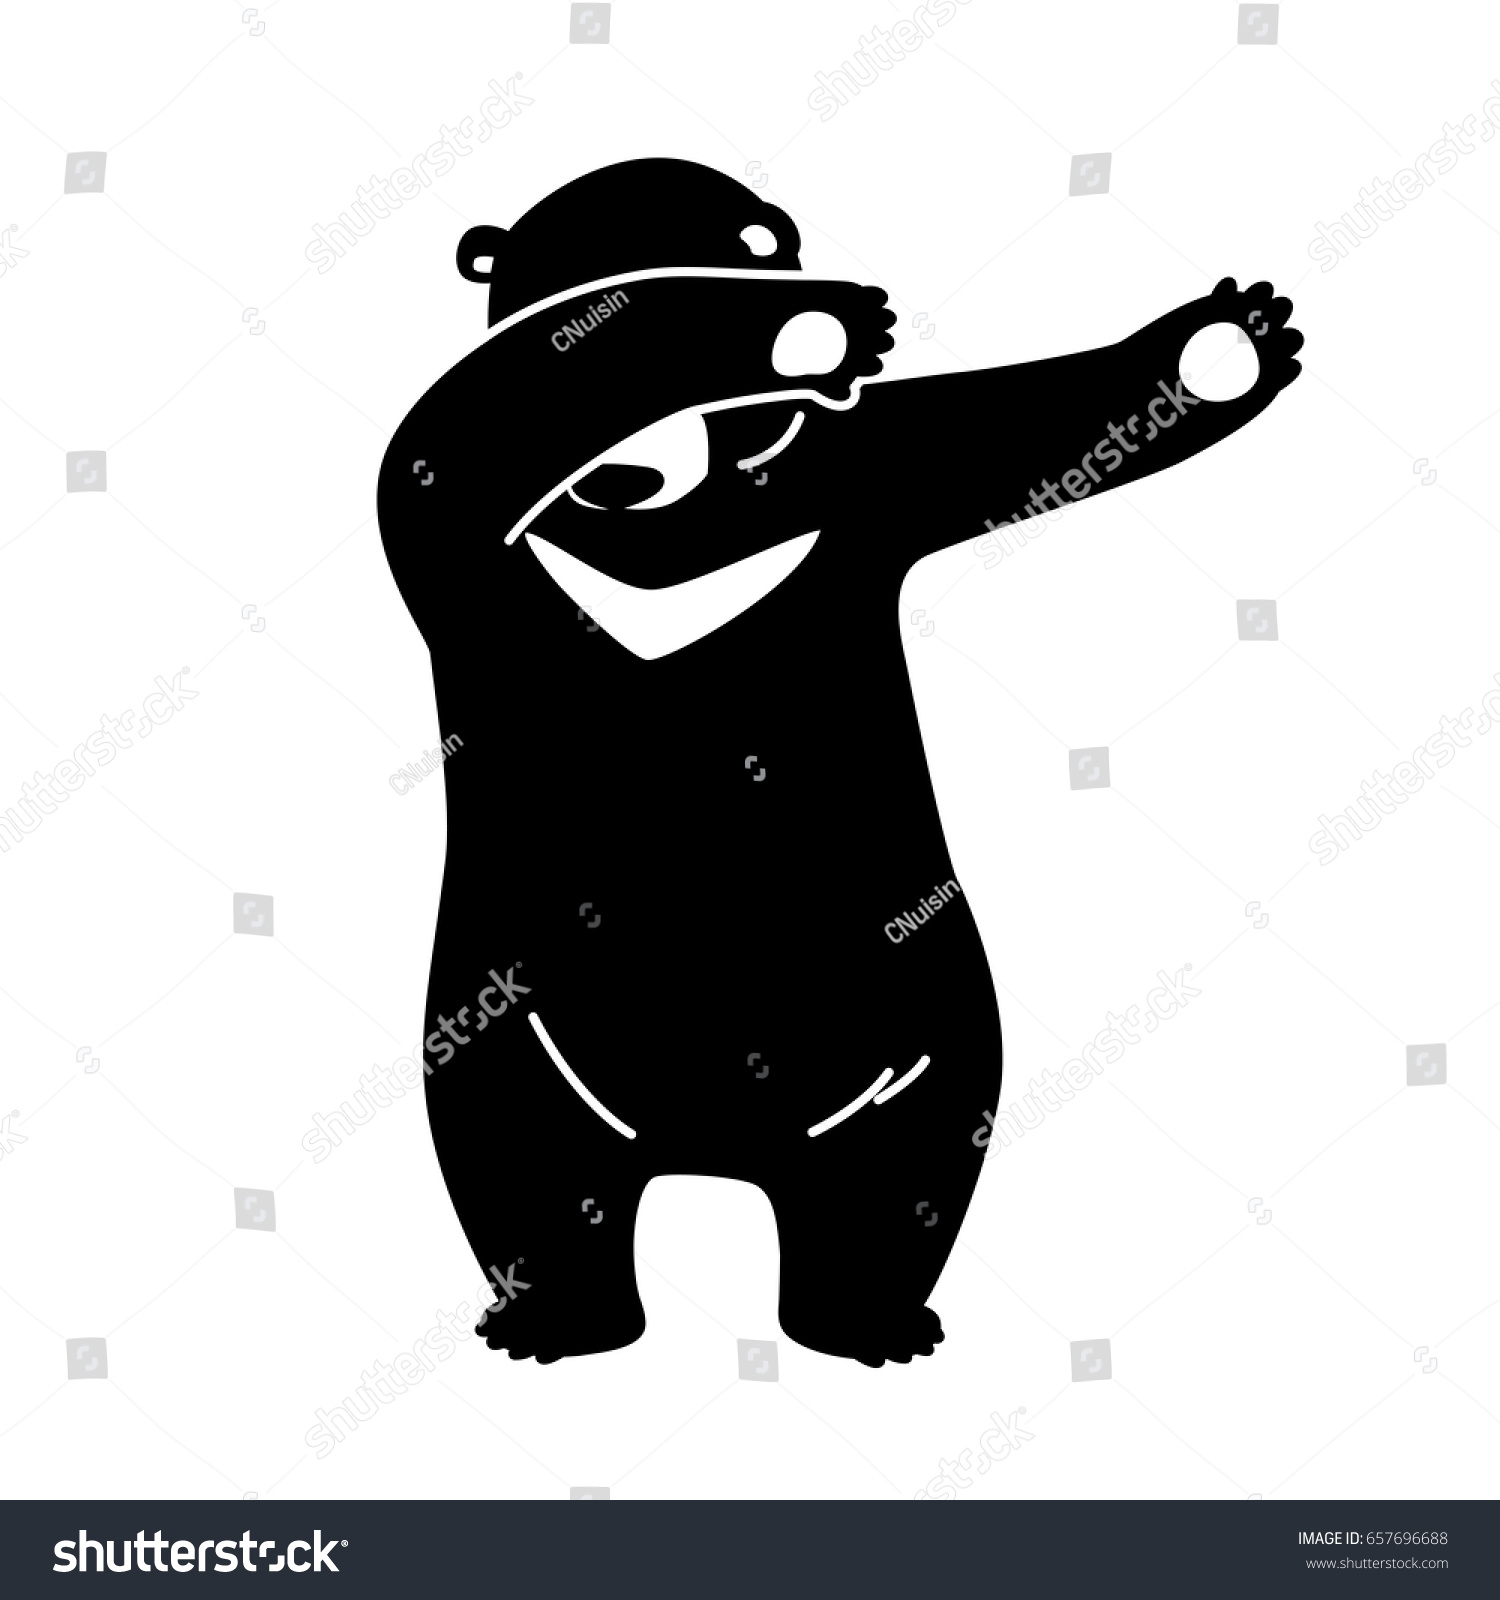 dabb dance. bear polar dab dance vector illustration dabb